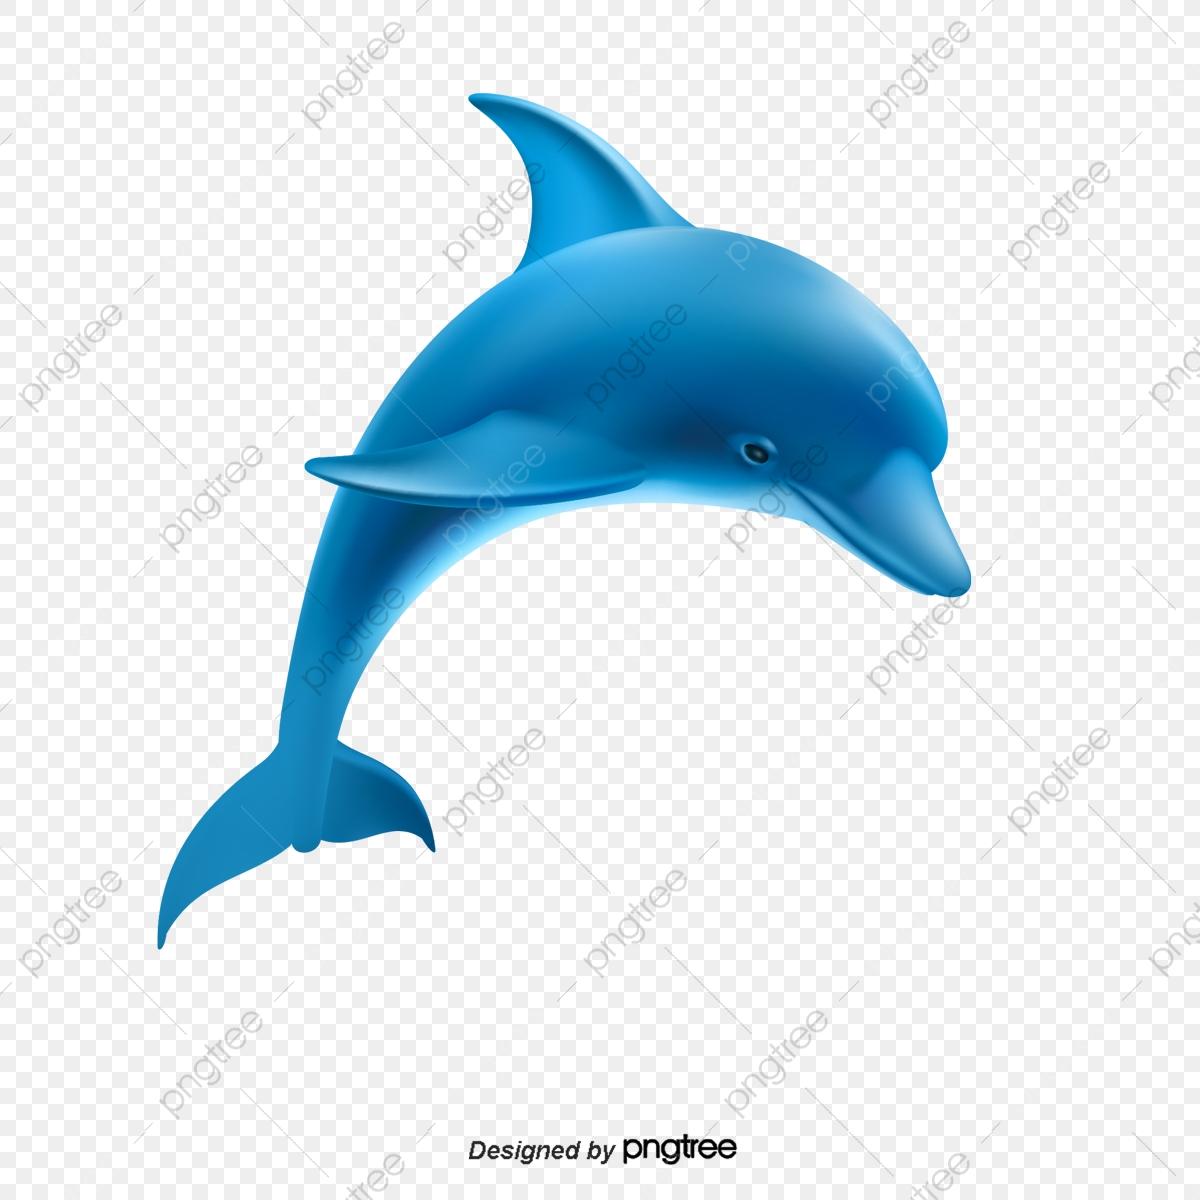 Cartoon Dolphin, Cartoon, Dolphin, Fish PNG Transparent Clipart.